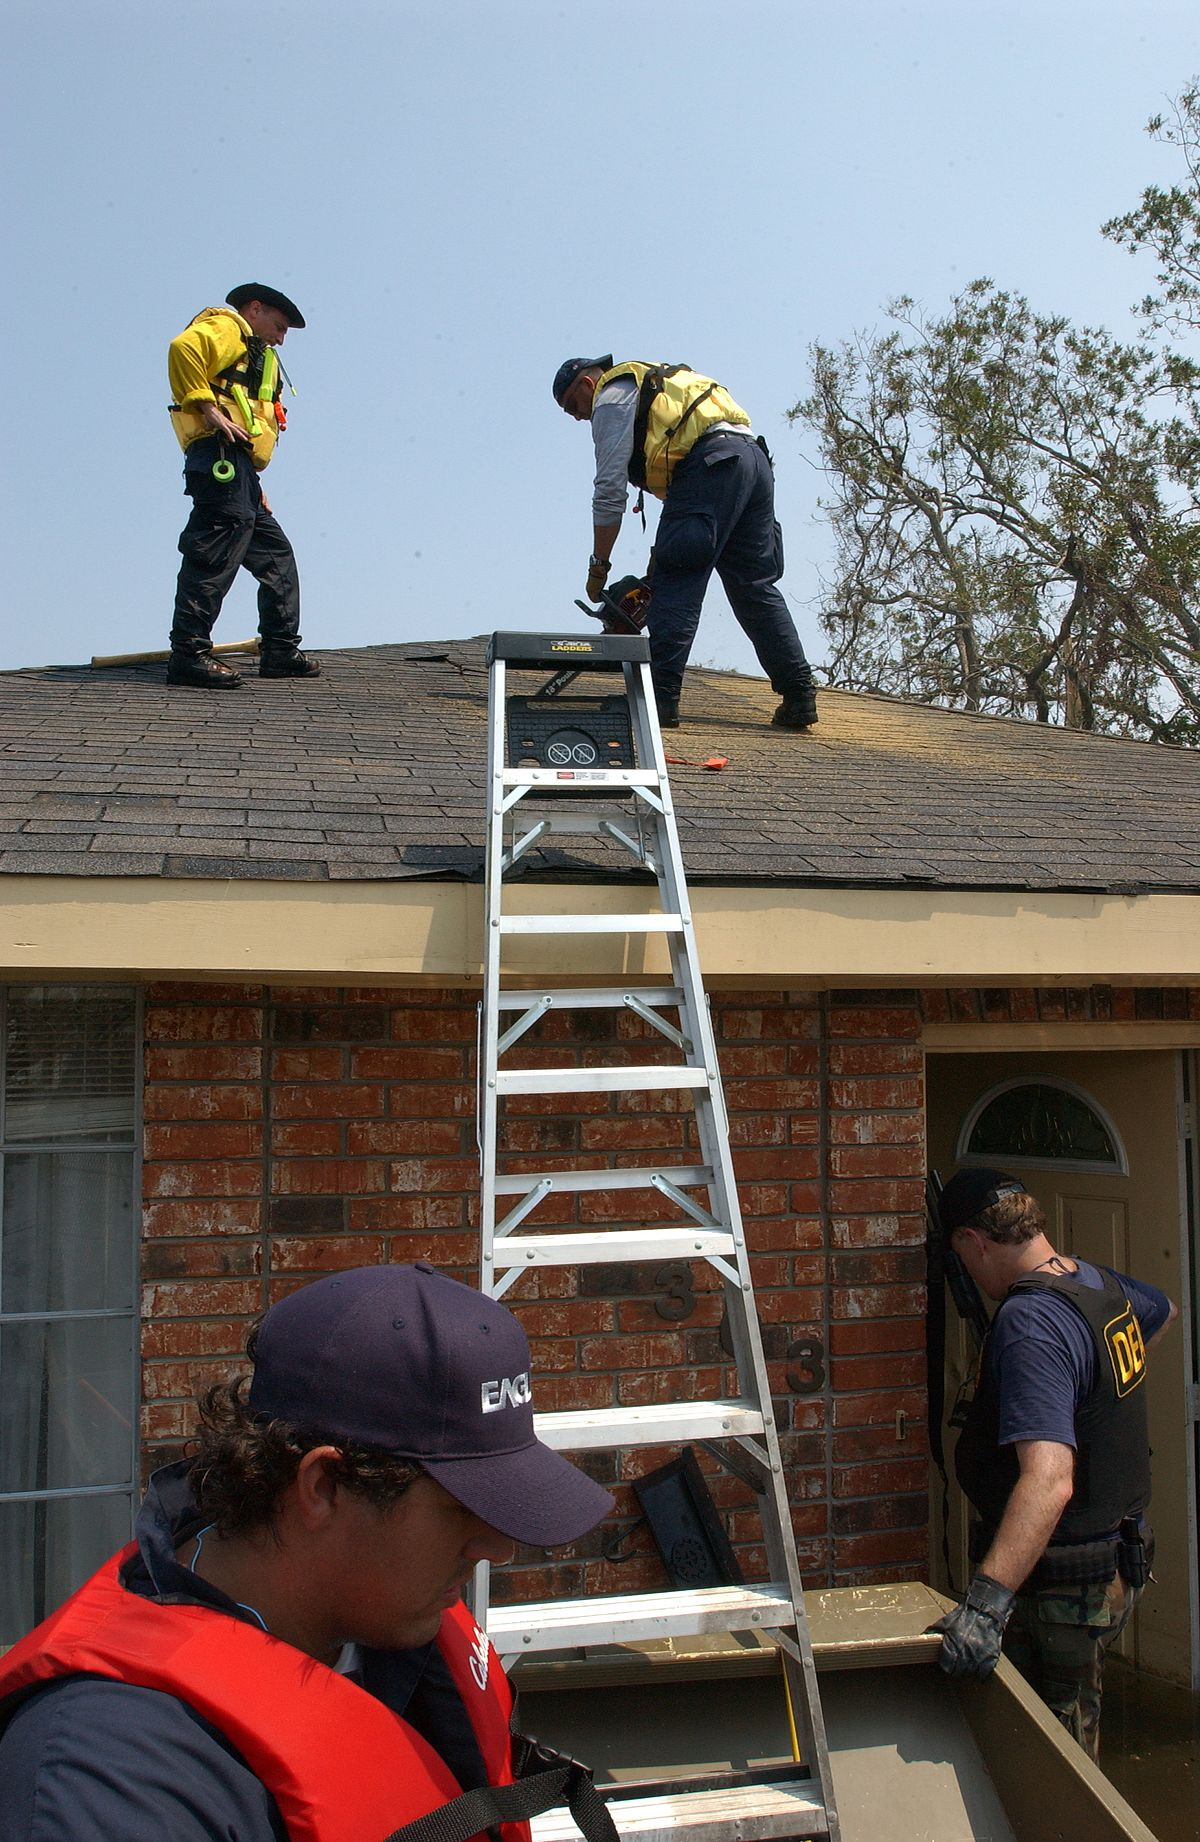 ladder - Wiktionary